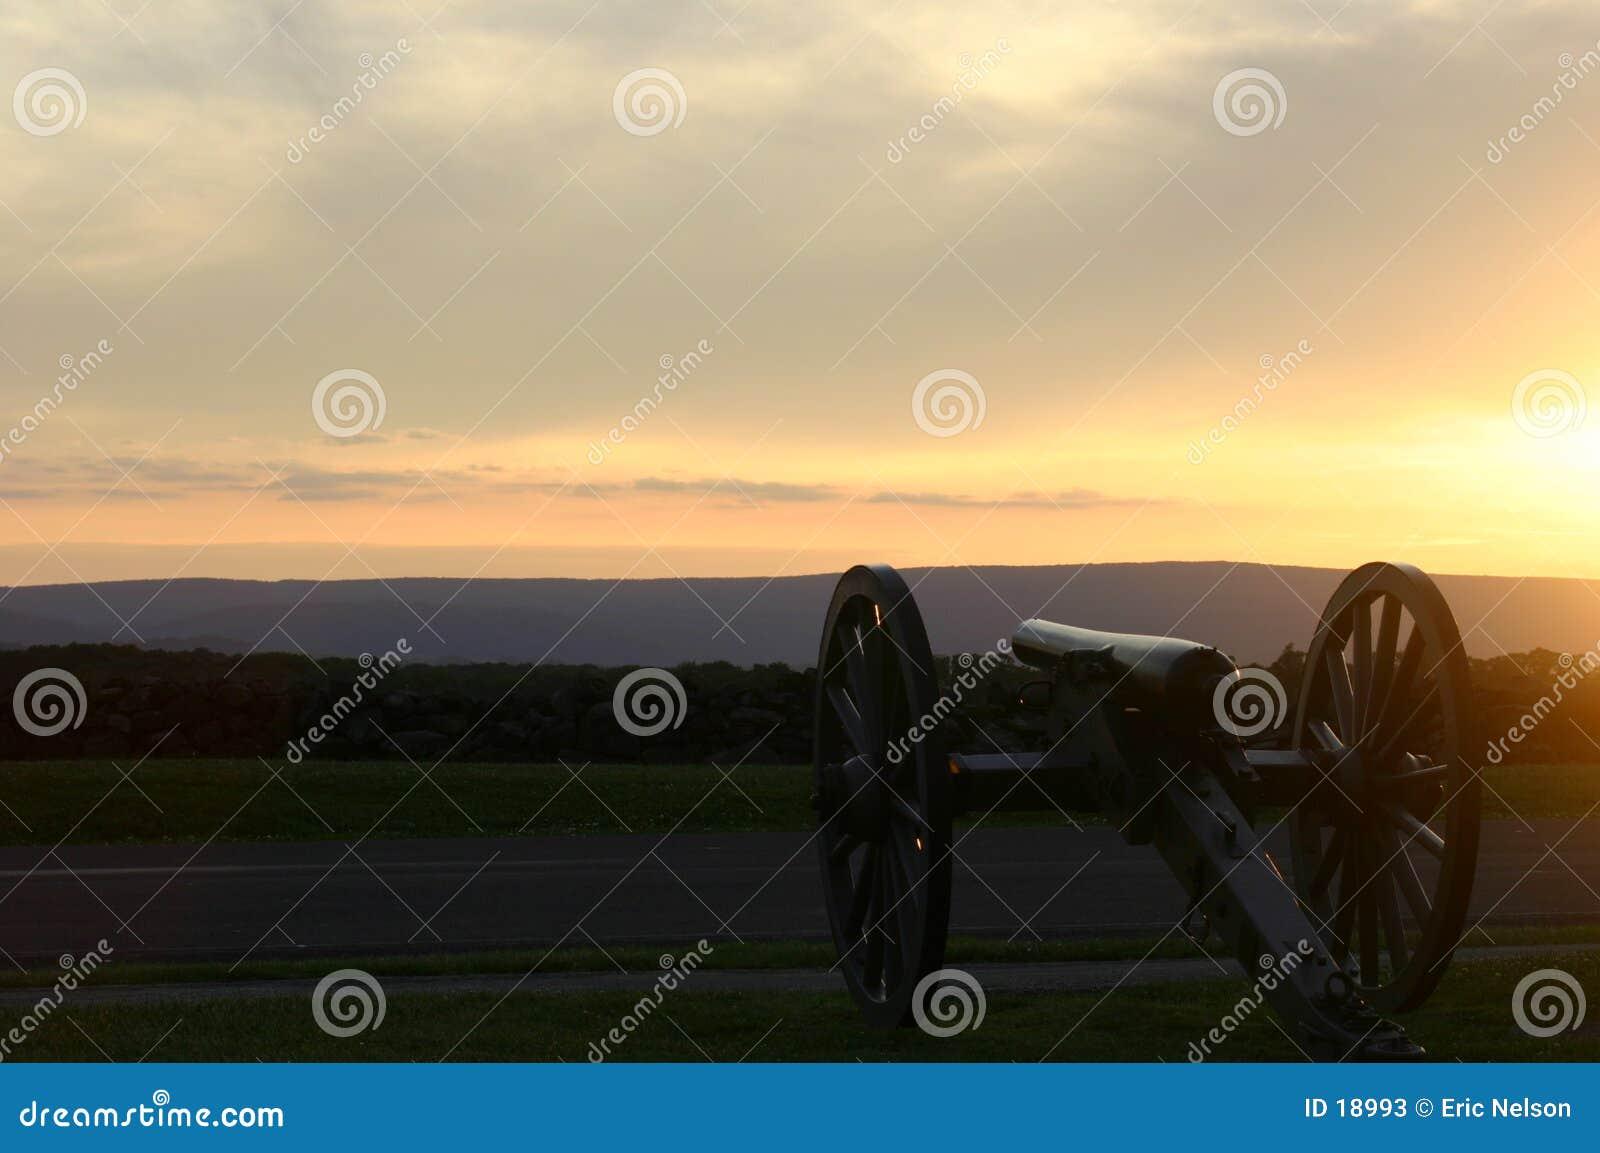 Gettysburg Natl Military Park